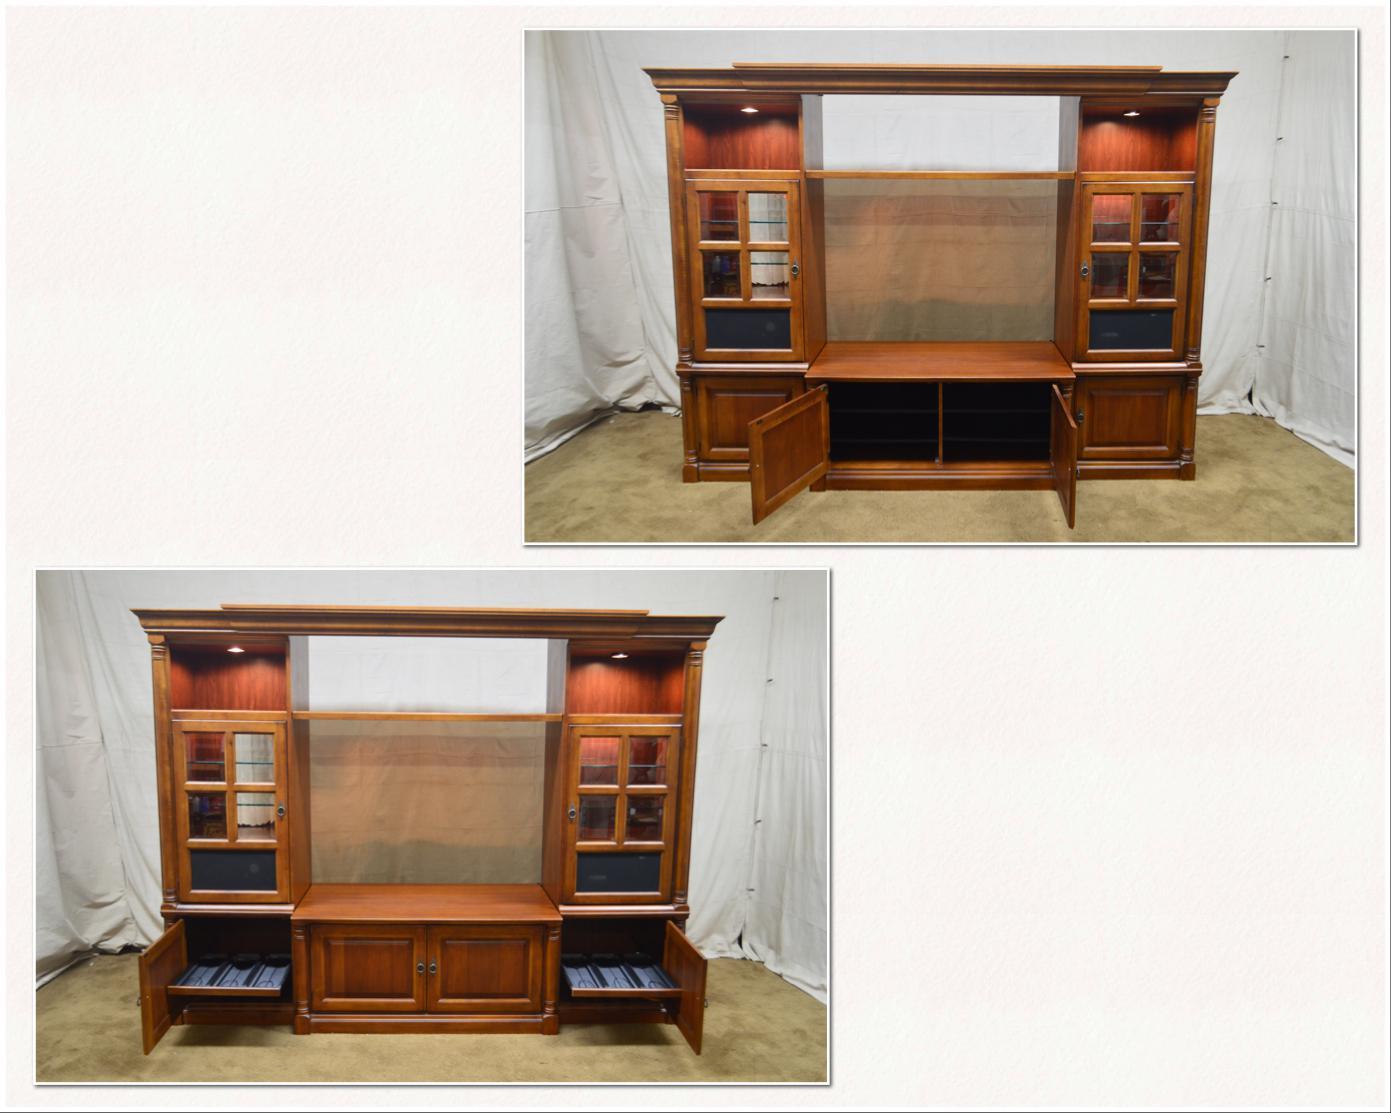 *STORE ITEM #: 18224 Ax Hooker Furniture Large Cherry Entertainment TV Unit  W